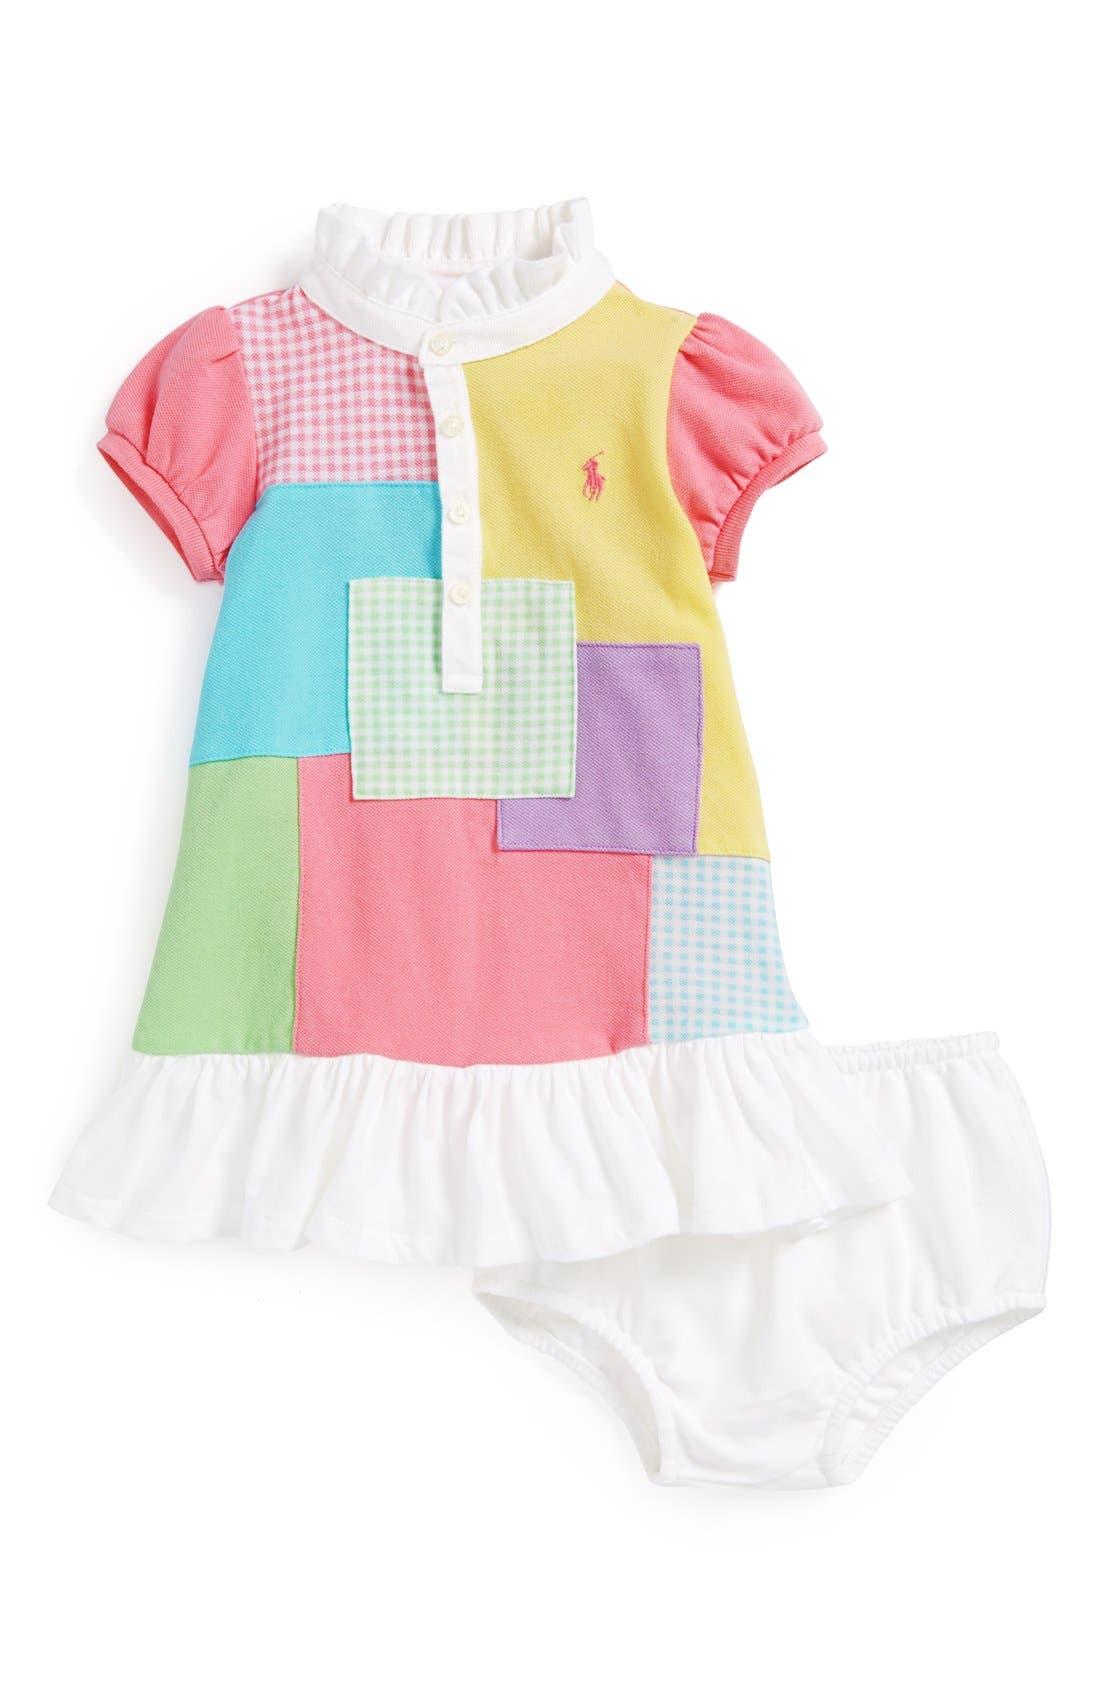 Main Image - Ralph Lauren Patchwork Dress & Bloomers (Baby Girls)